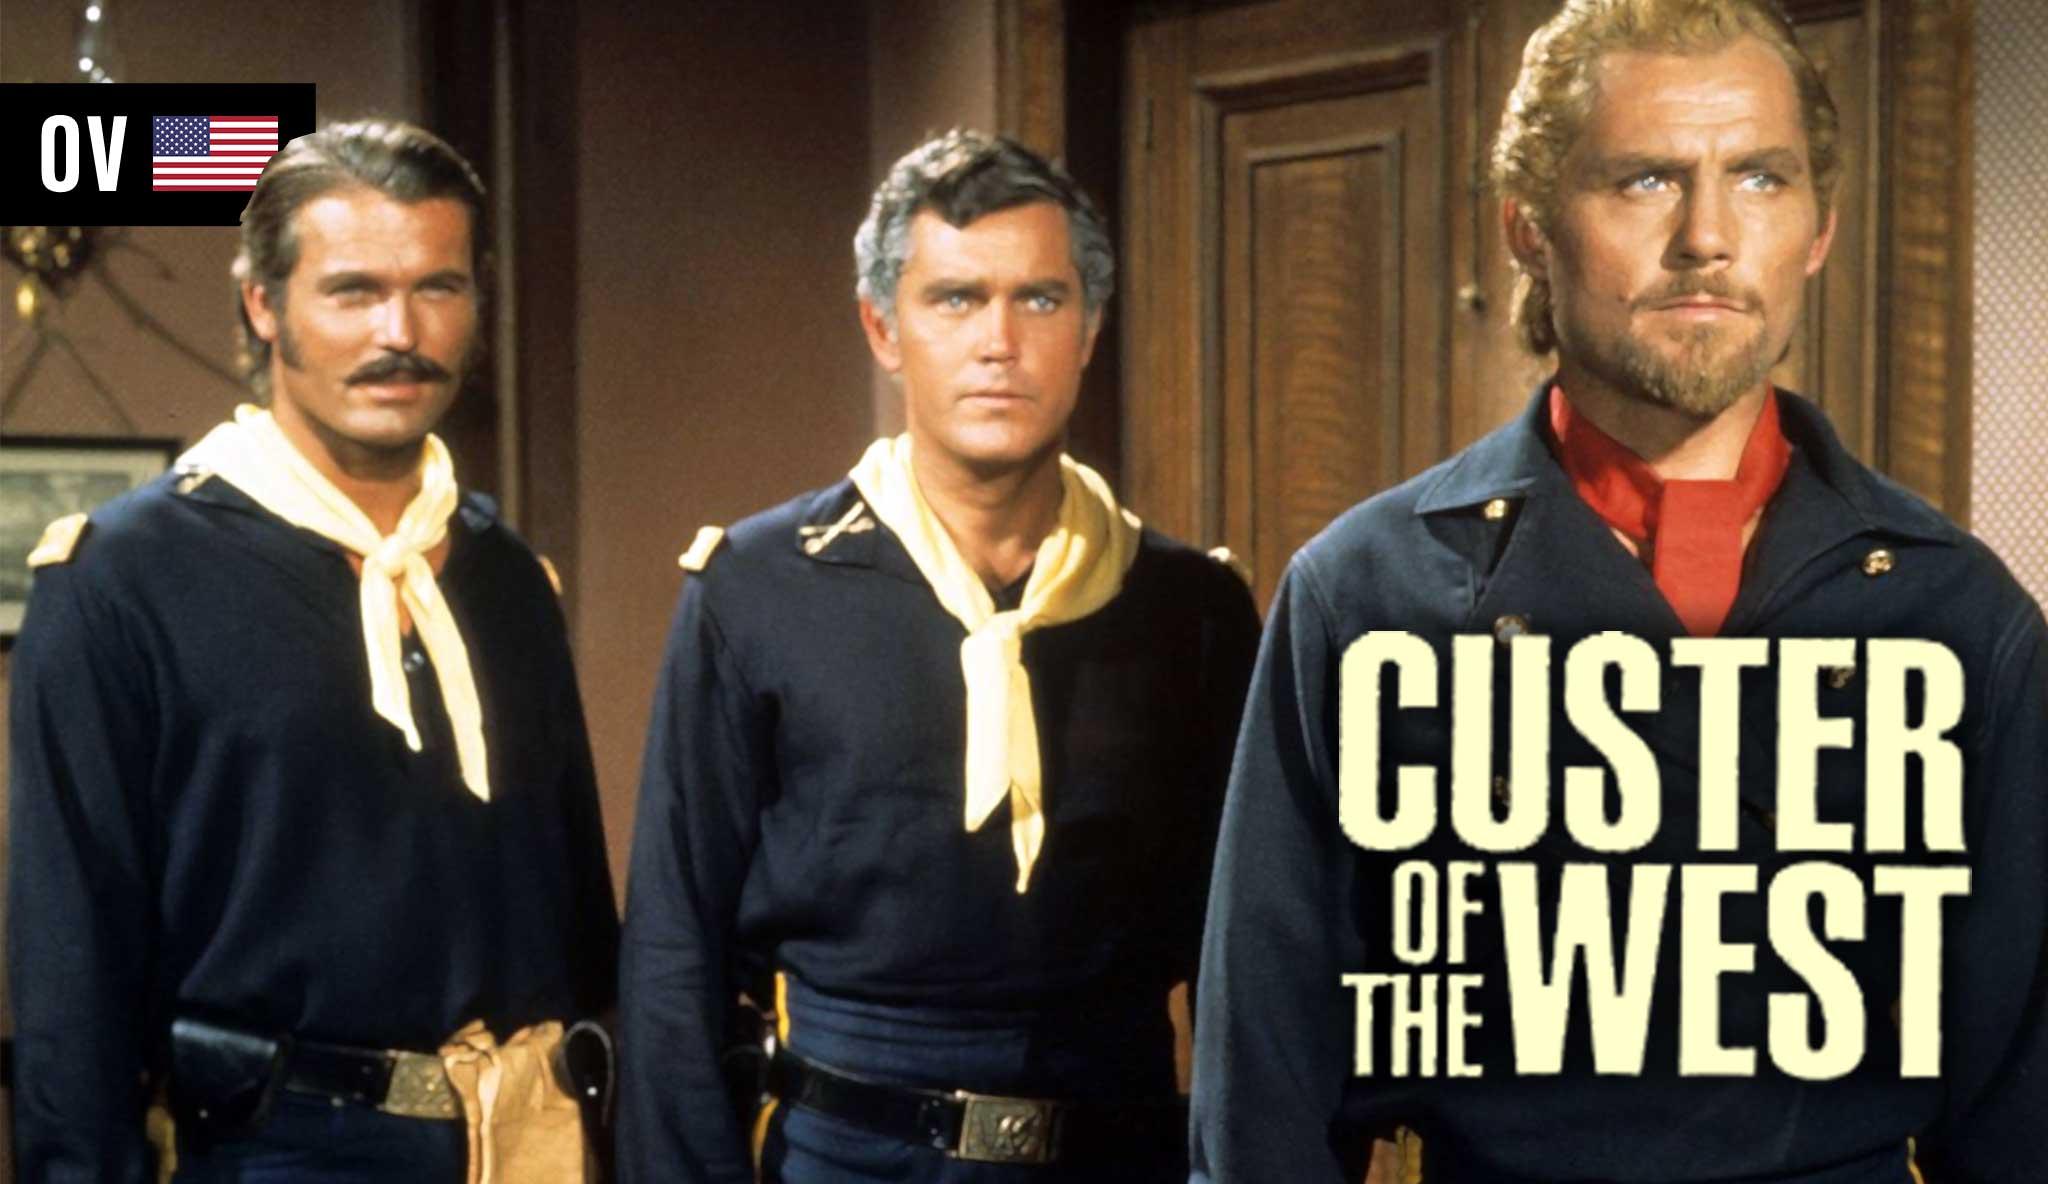 custer-of-the-west\header.jpg